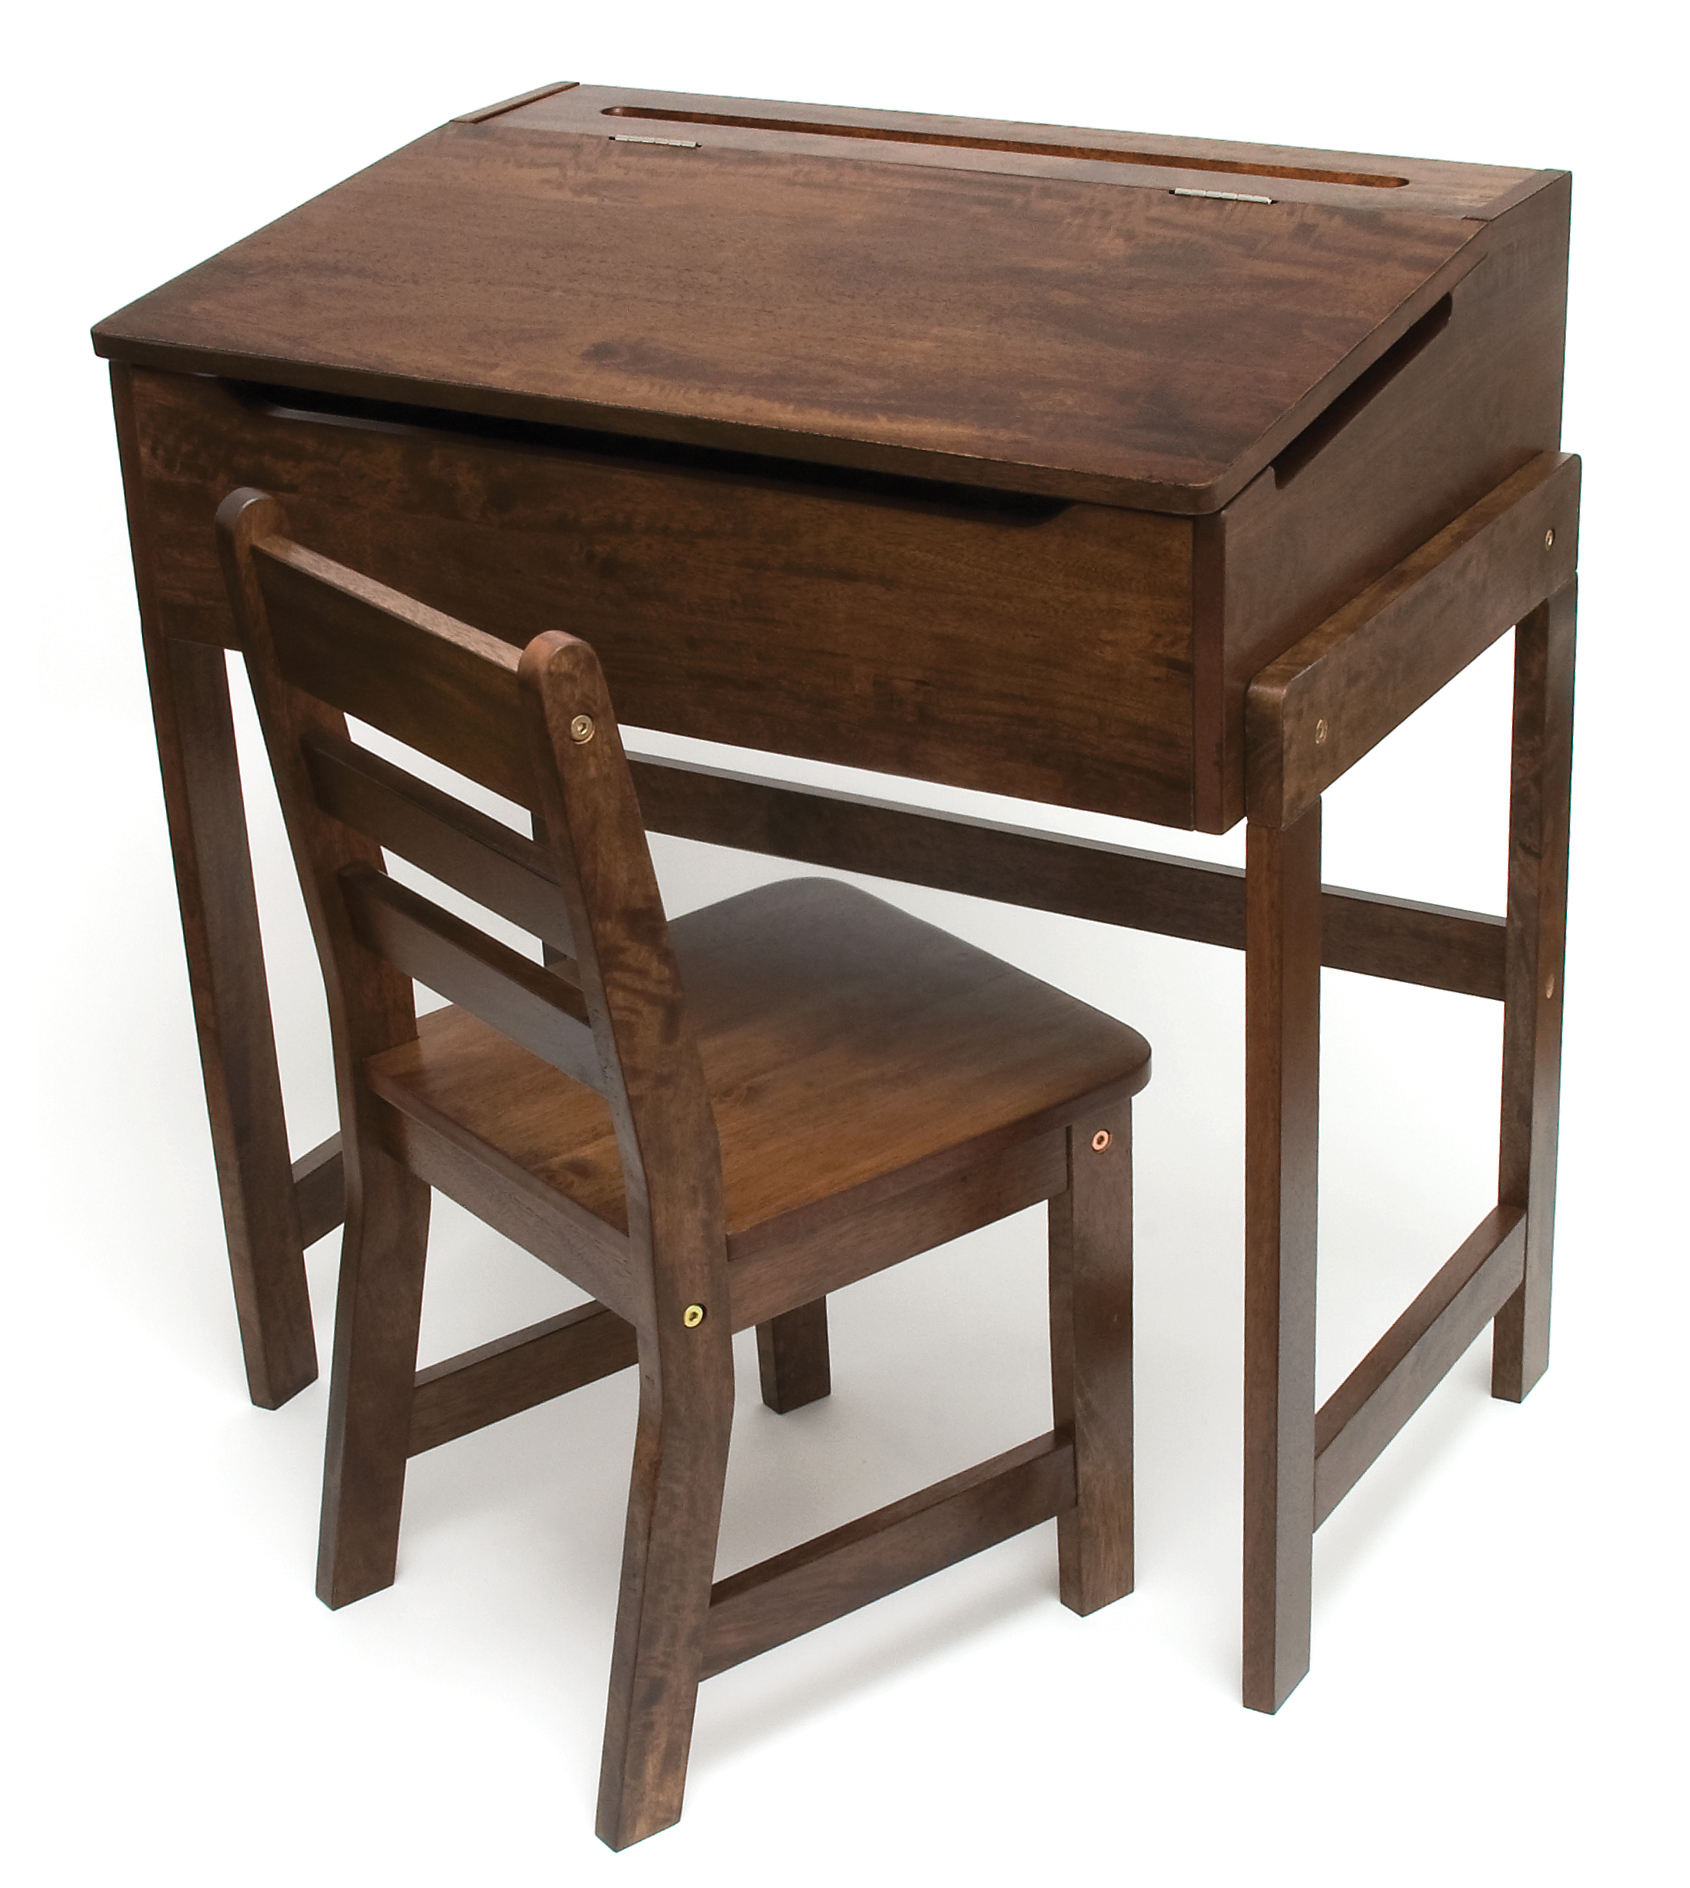 Classroom Desks For Sale Office Desk With Filing Cabinet